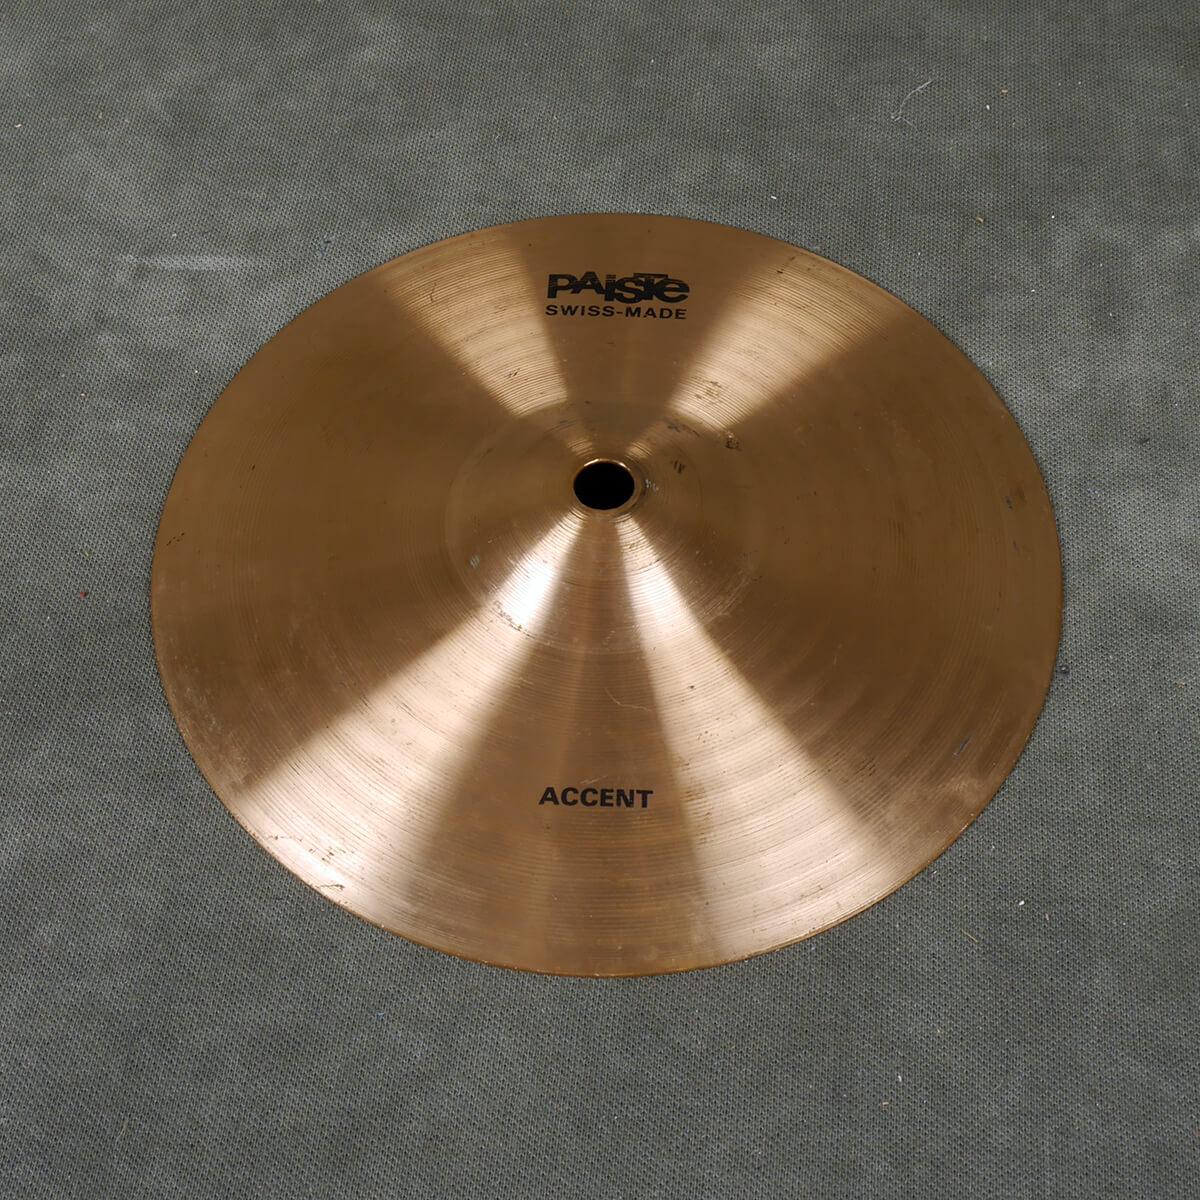 Paiste Accent 8″ Splash Cymbal (C46) - 2nd Hand